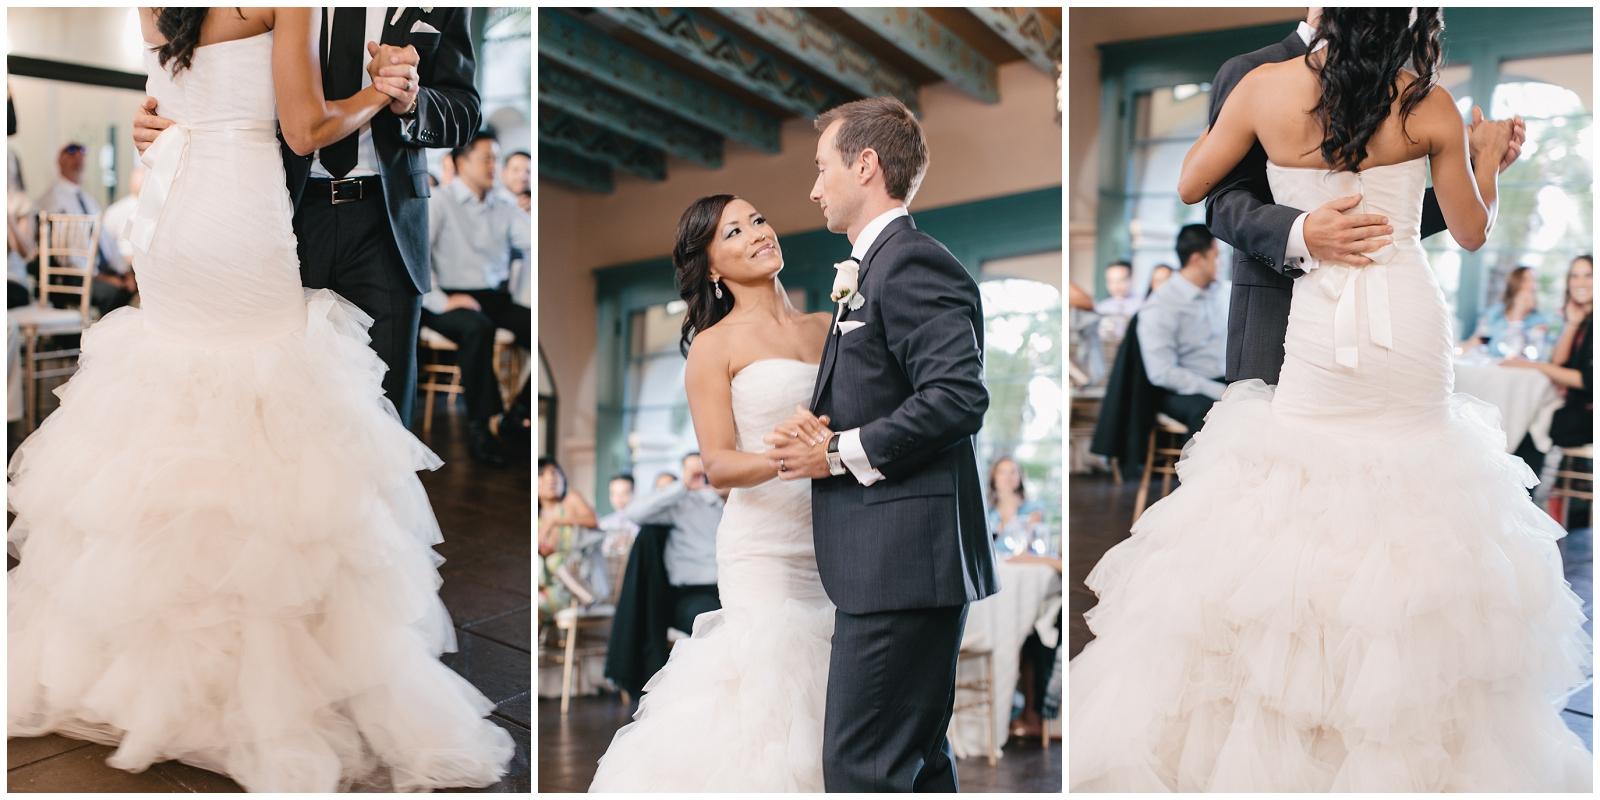 San-Francisco-Bay-Area-Wedding-Photography-Destination-22.jpg